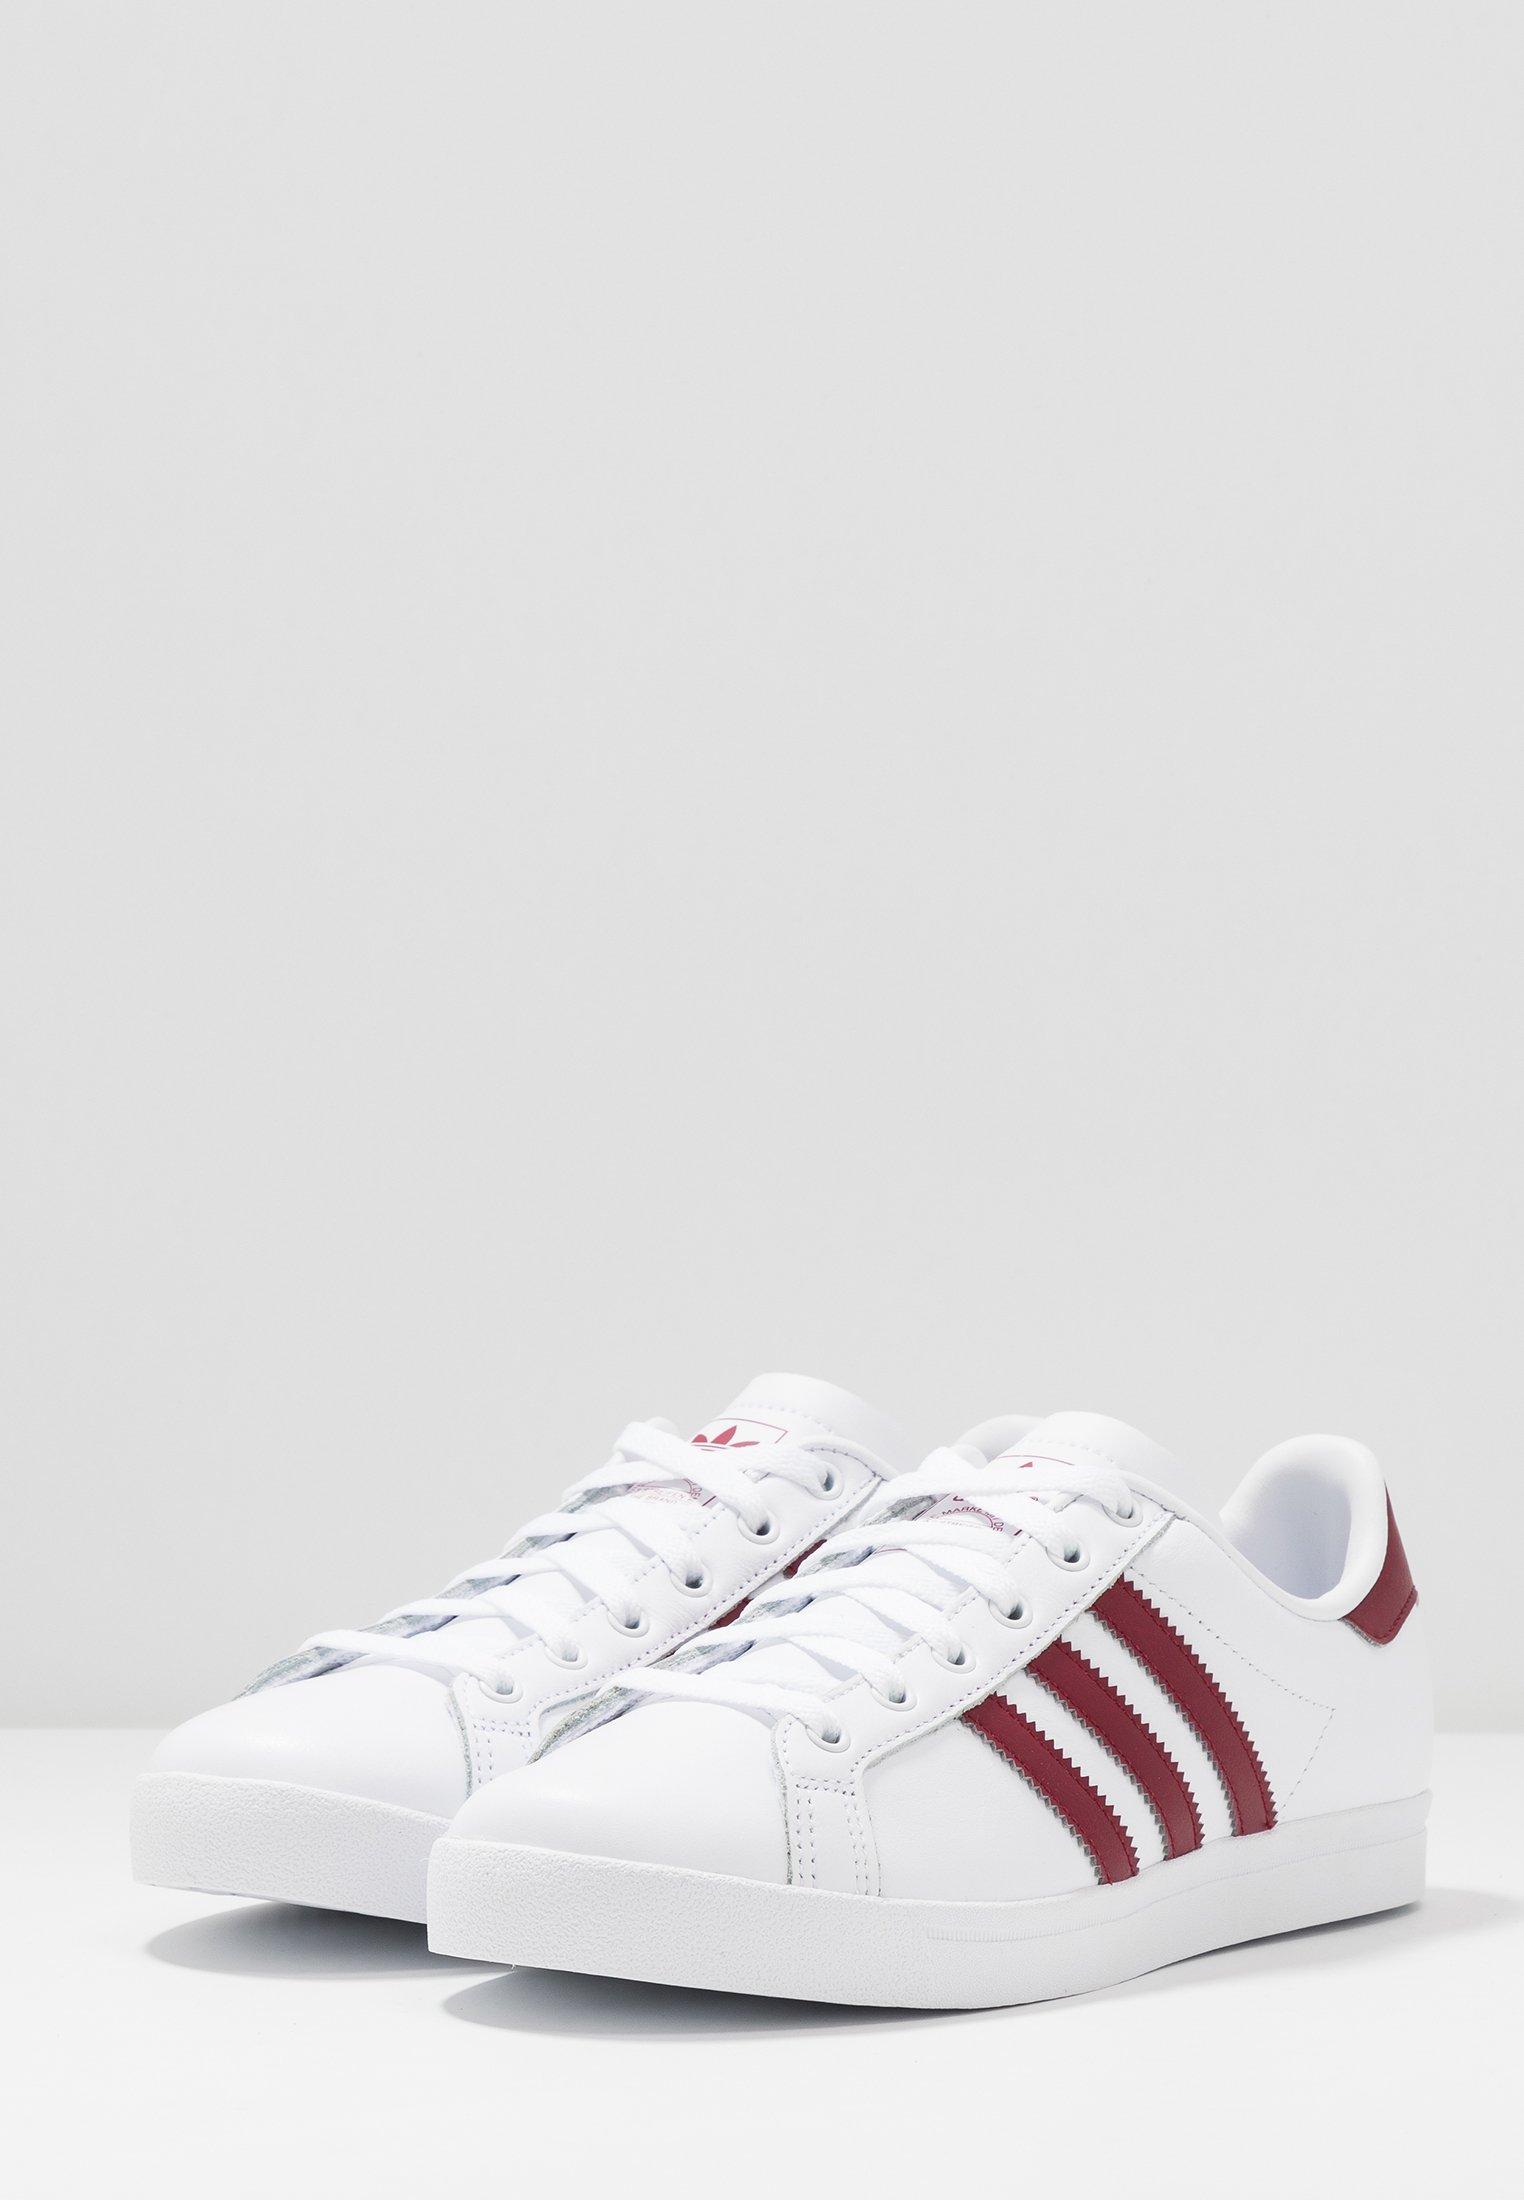 adidas Originals COAST STAR - Baskets basses footwear white/collegiate burgundy